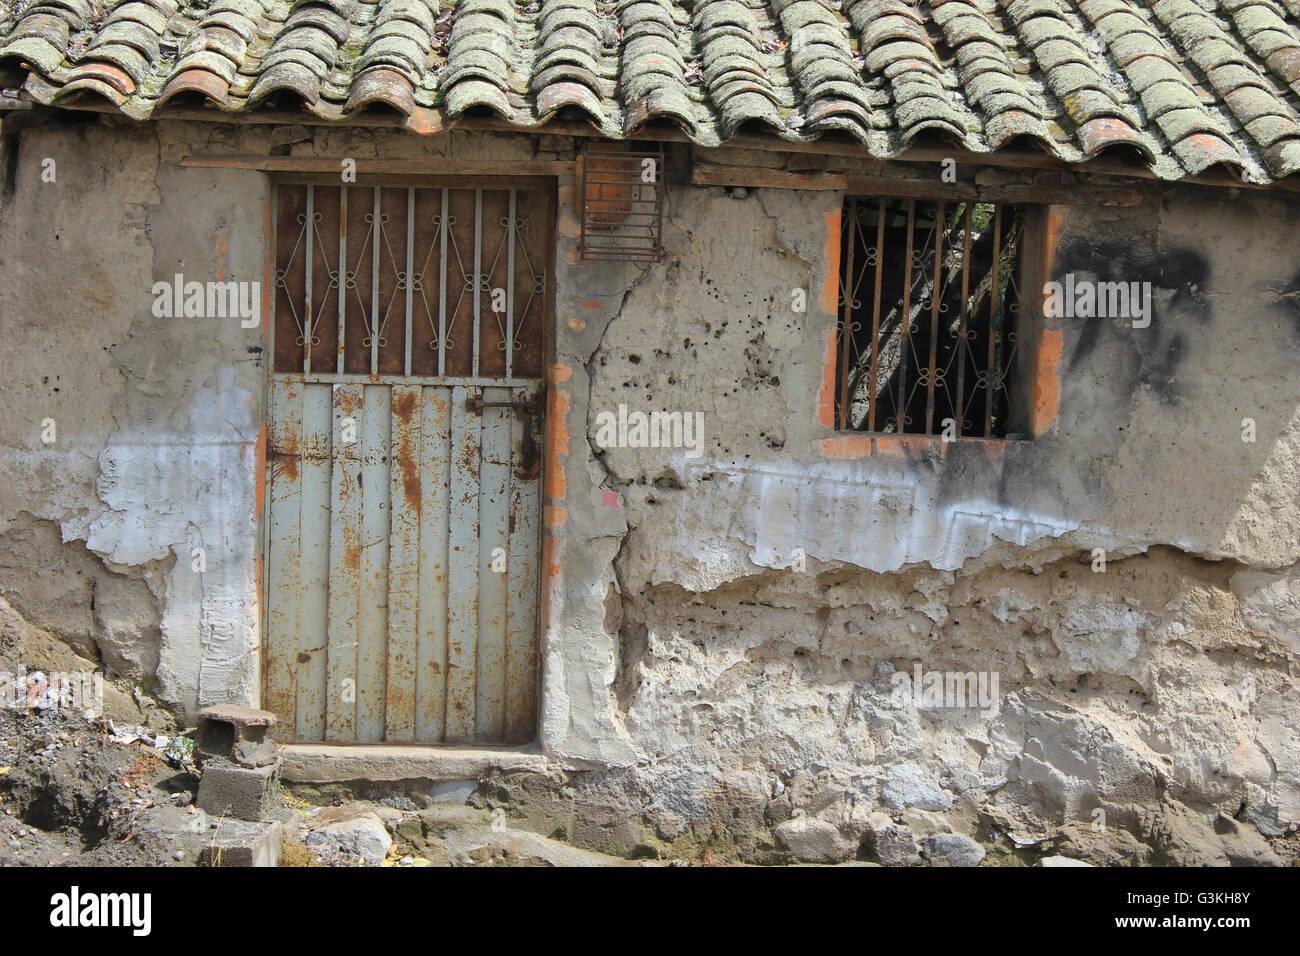 Rusty Metal Door an old building with a rusted metal door and barred window in